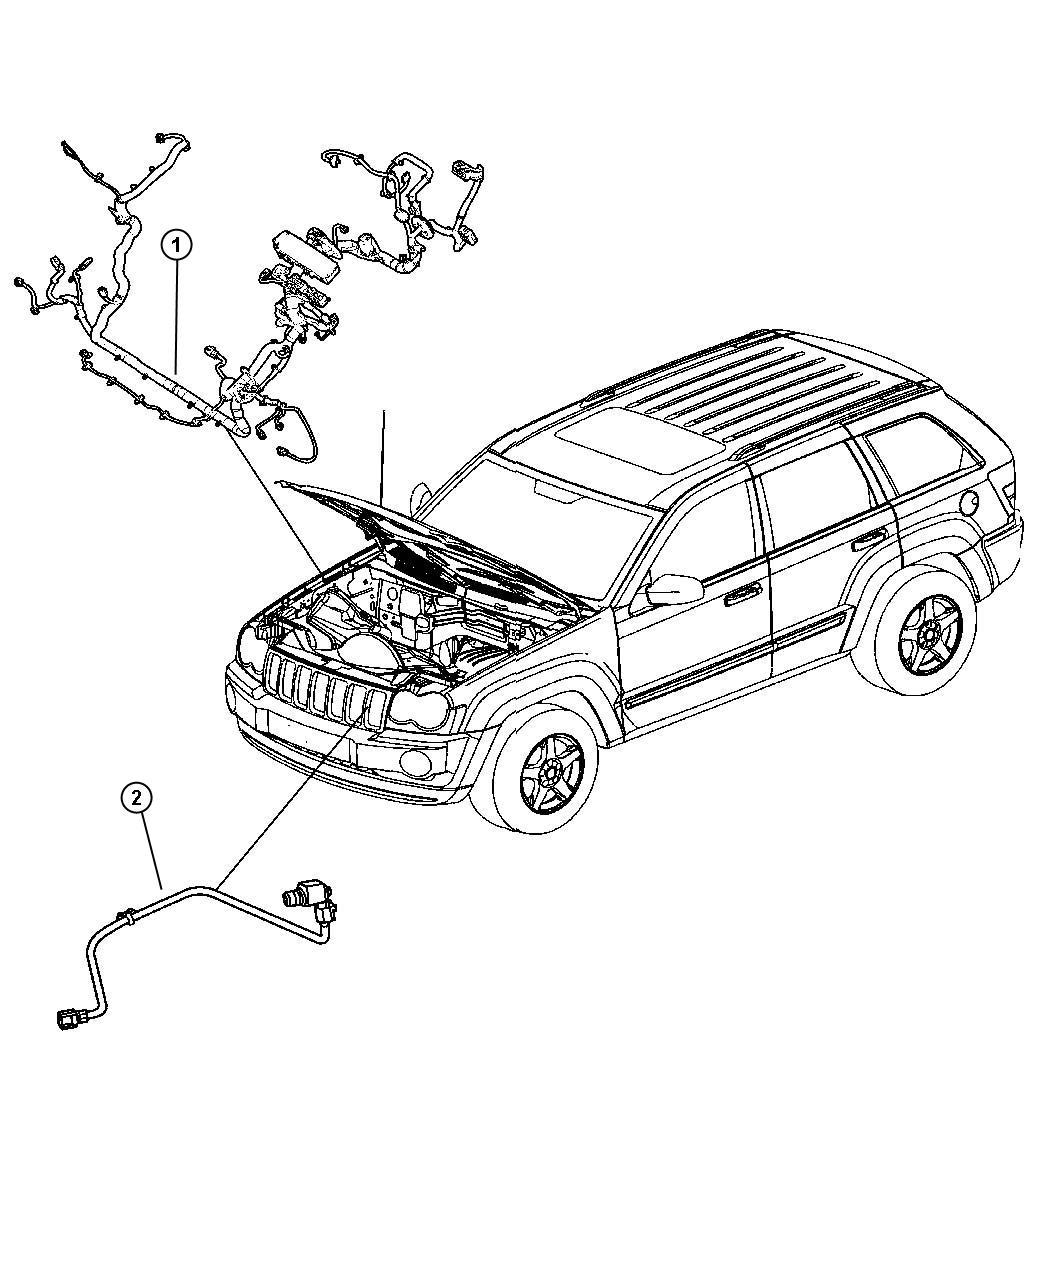 Jeep Commander Harness, resistor, wiring. Jumper, radiator